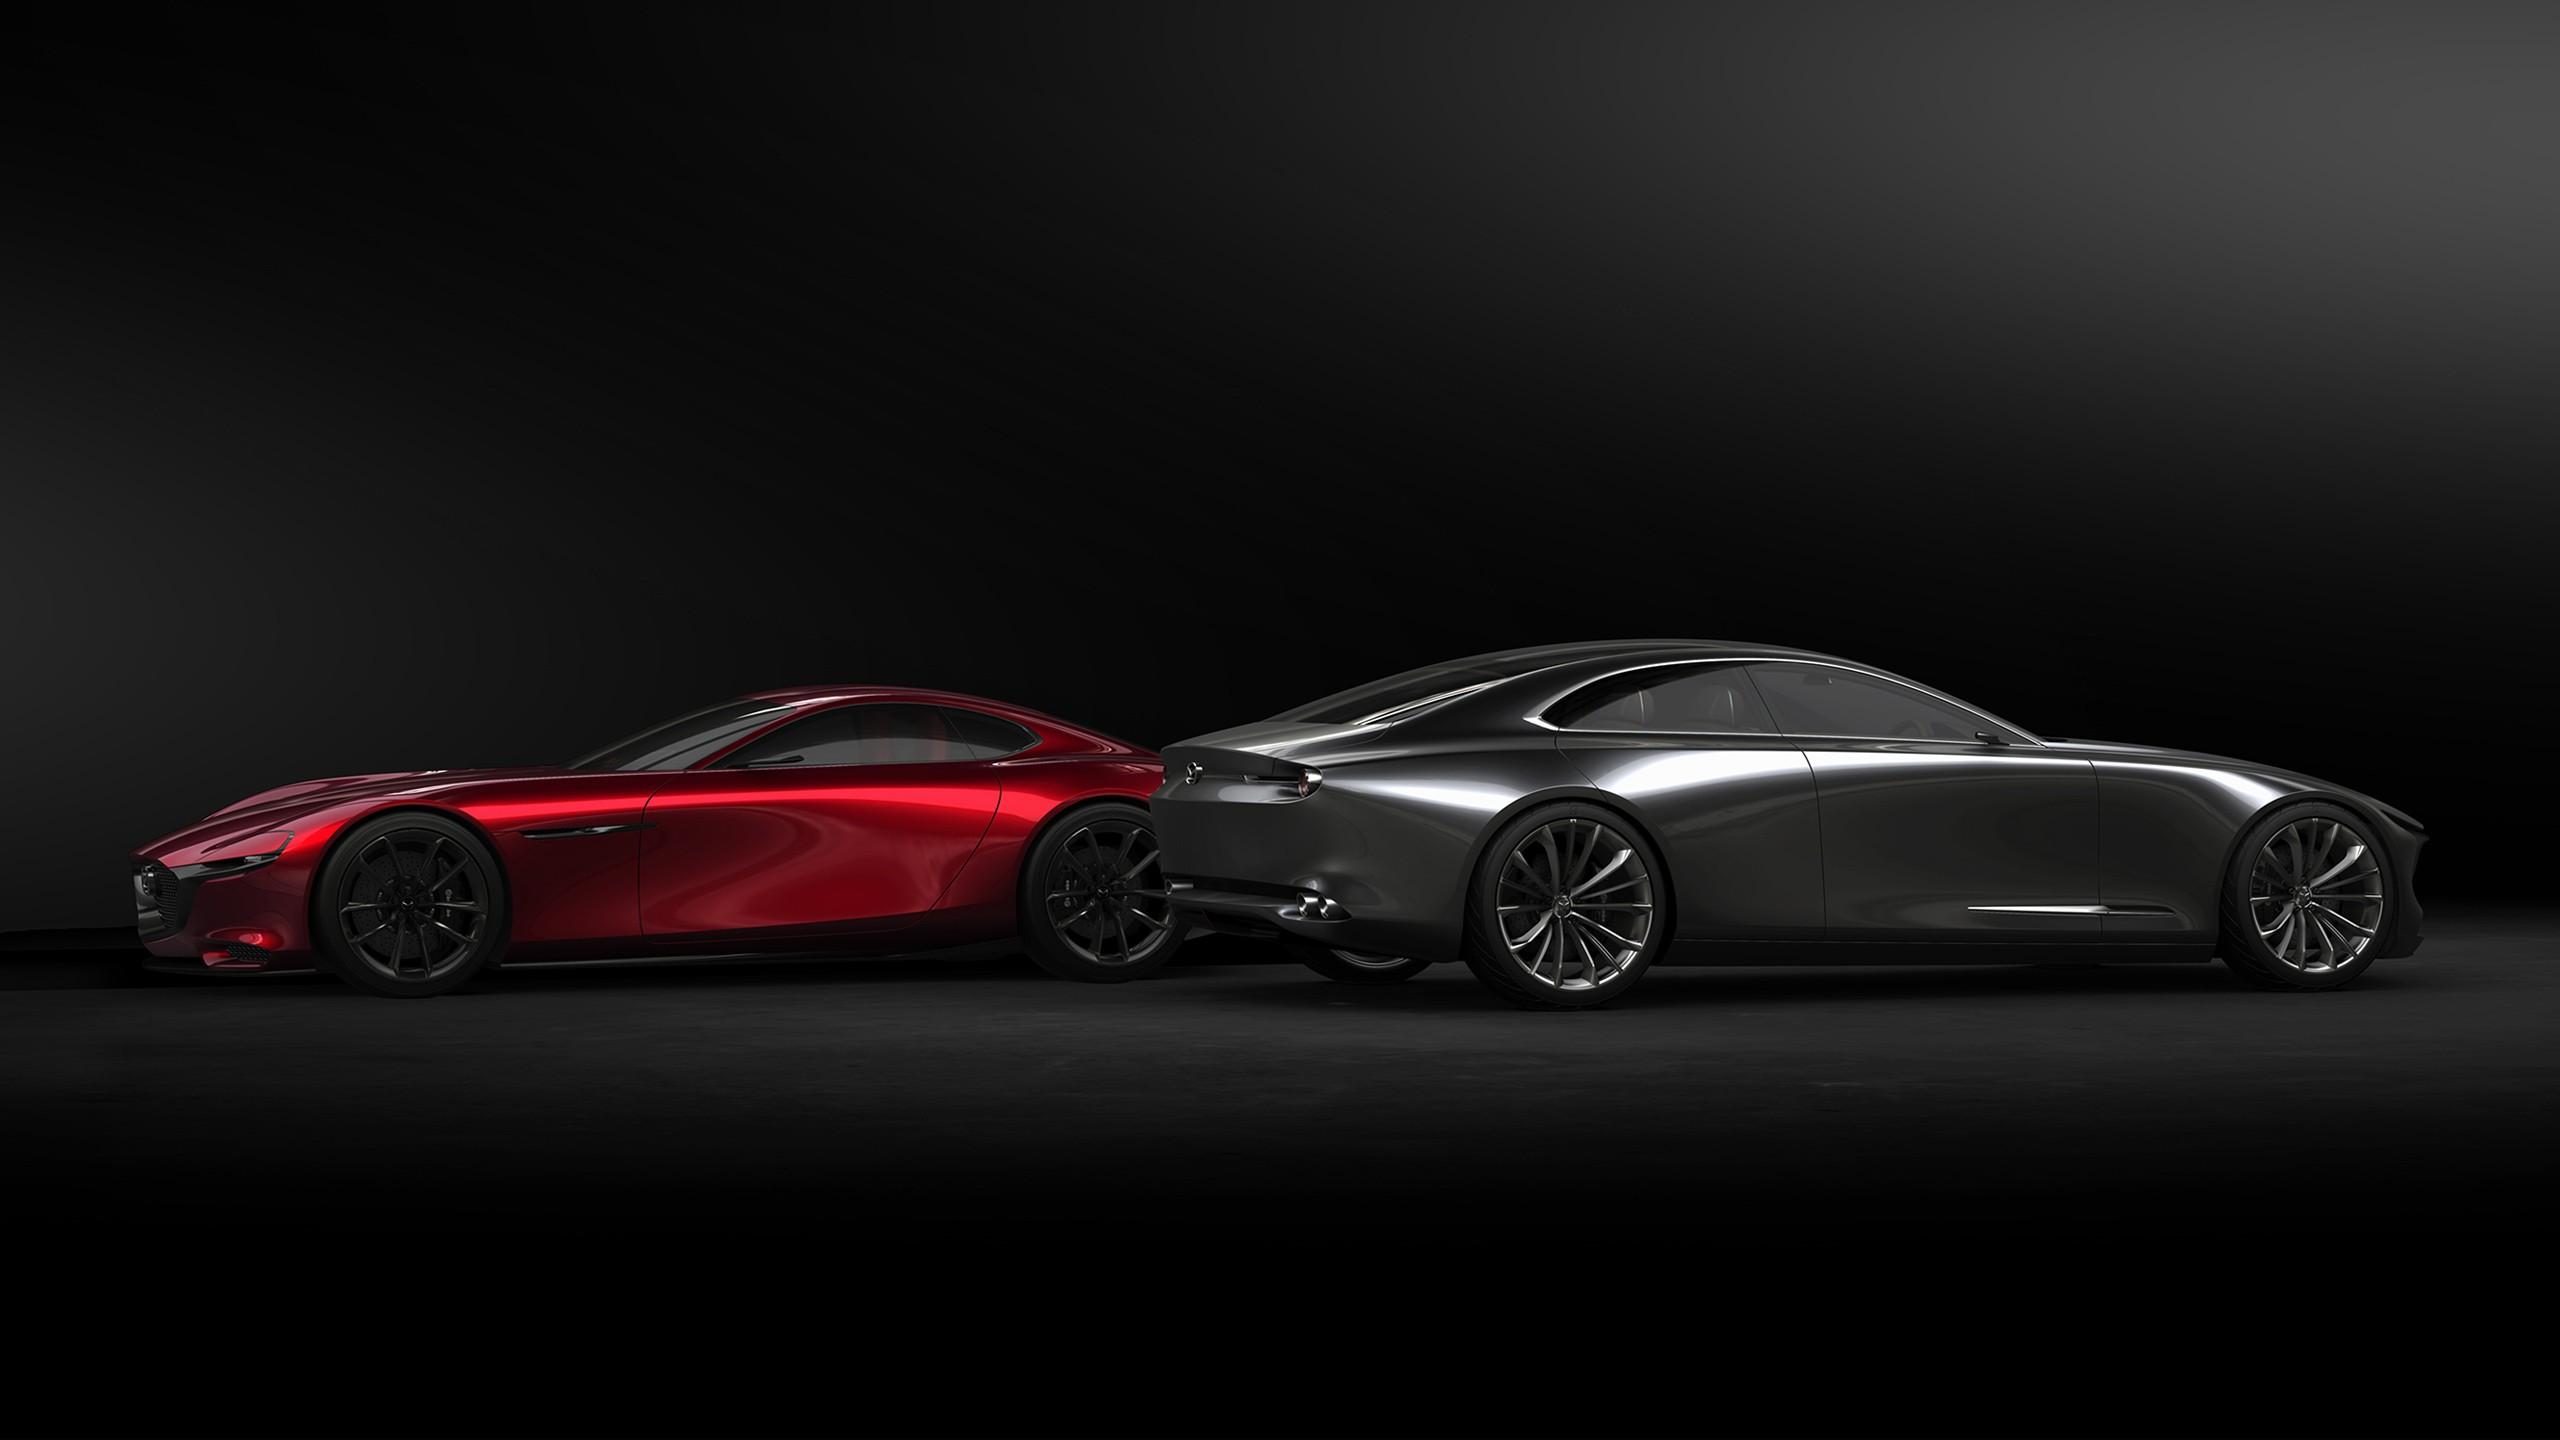 Mazda RX Vision Mazda Vision Coupe Concept Cars Wallpaper | HD Car Wallpapers | ID #8897